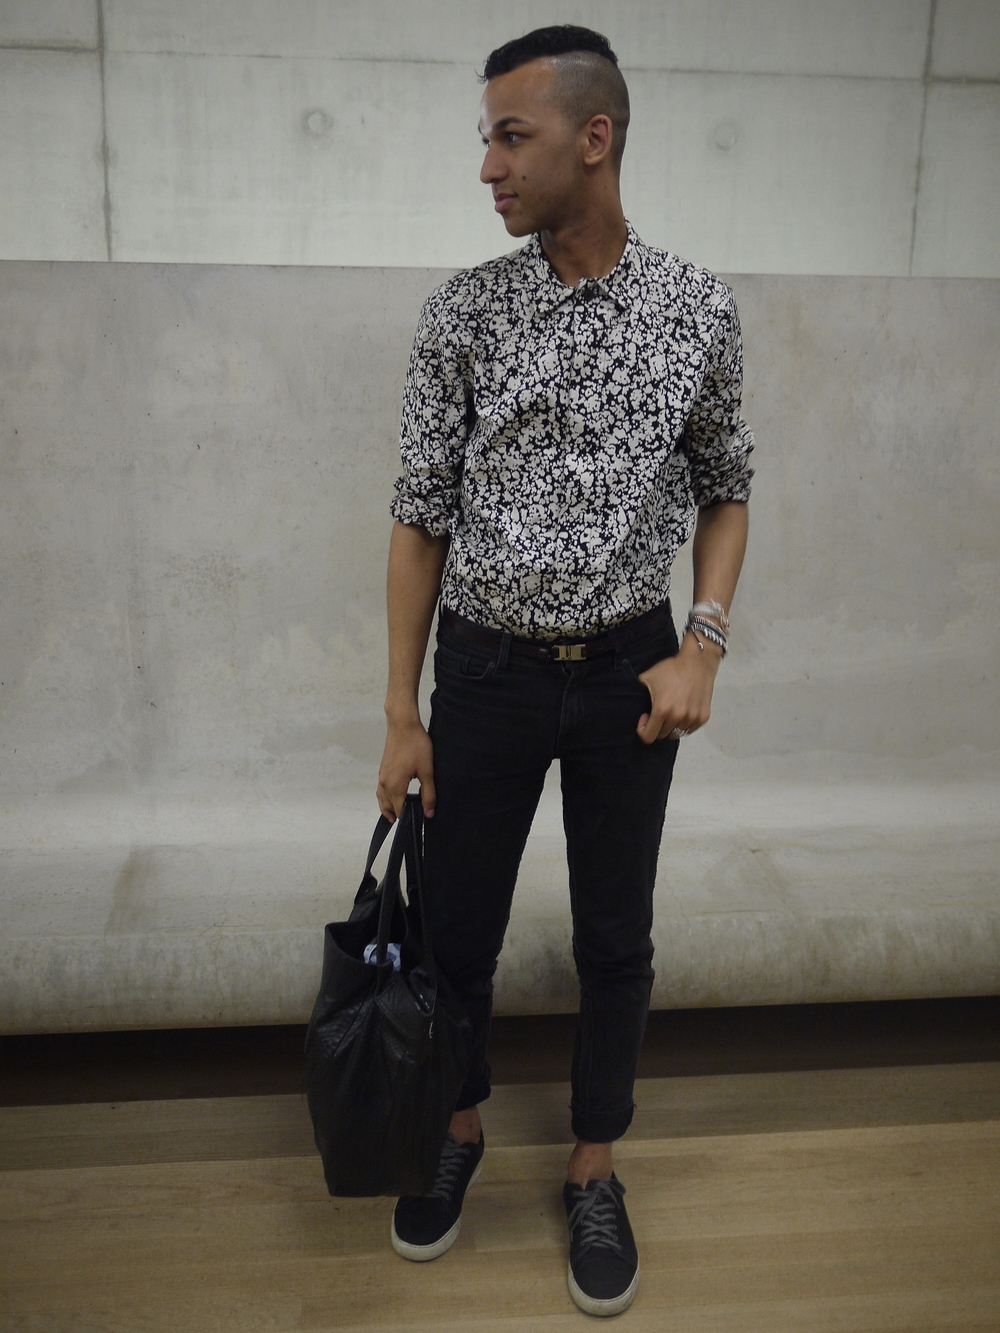 Wearing : Christophe Kane overshirt, Lanvin belt + shoes, HM studio Denim, Python + Watersnake tote, Miansai and links of london Bracelets